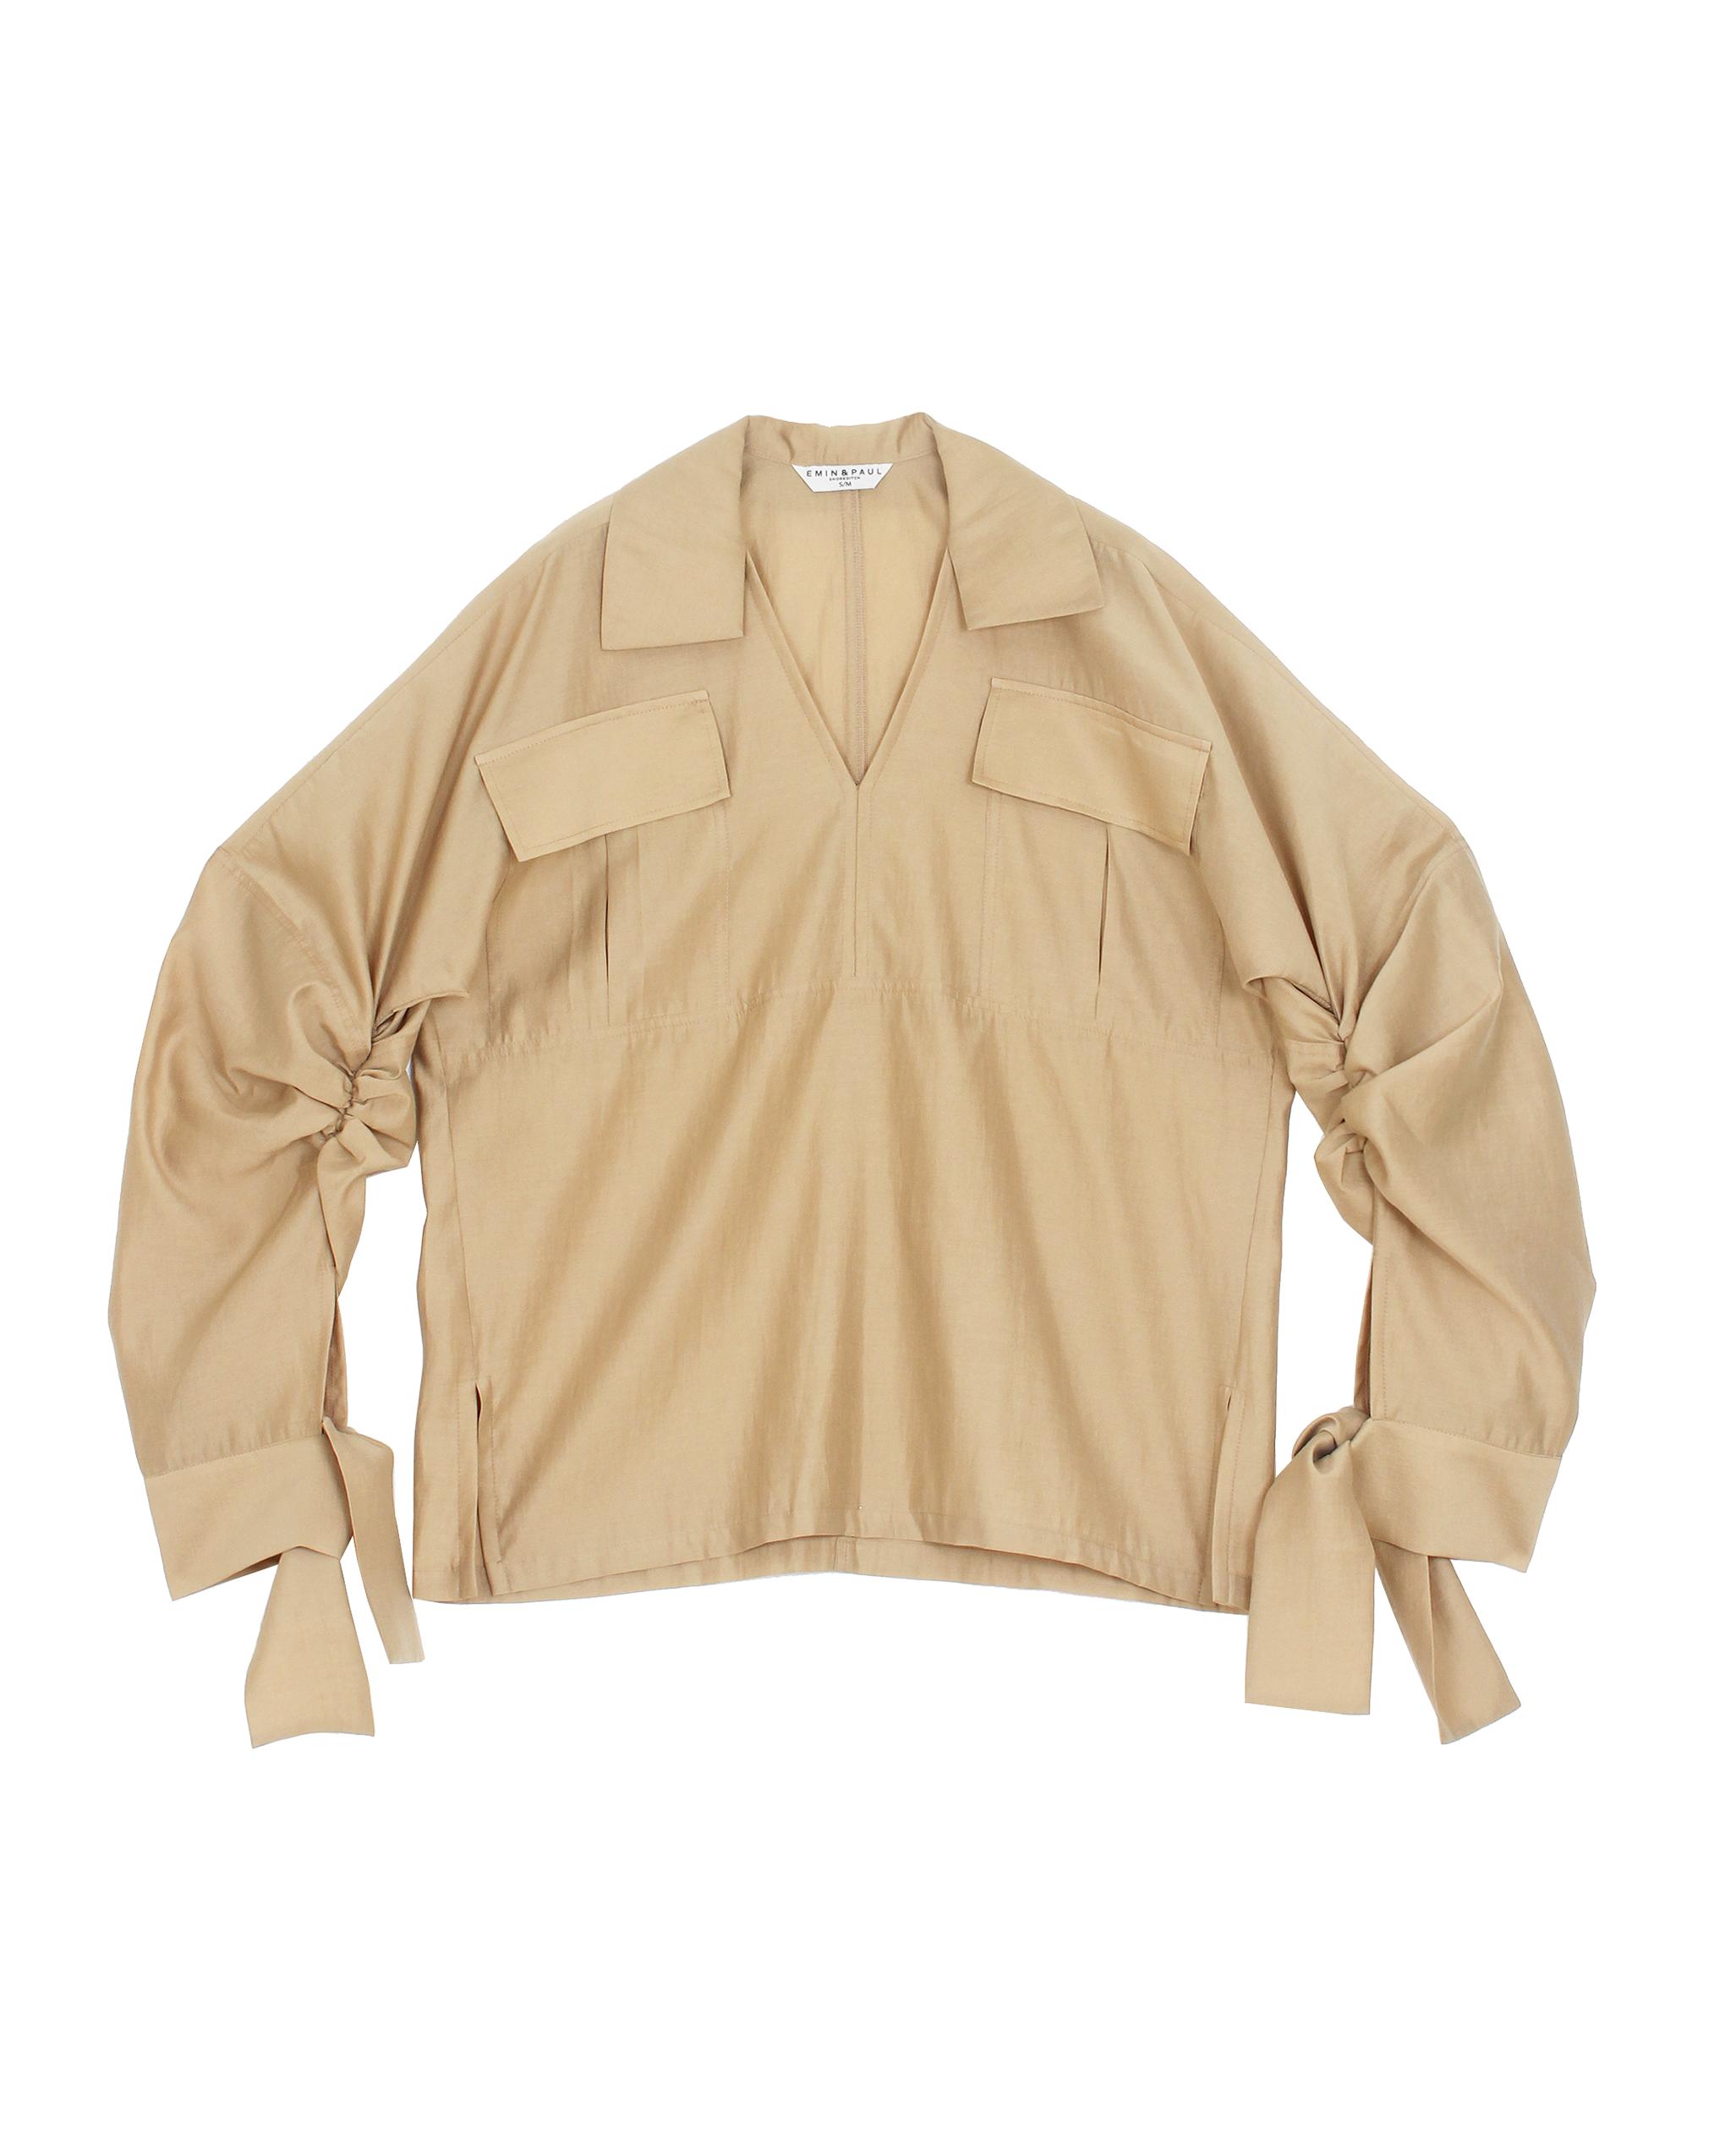 EMIN + PAUL khaki ruched sleeve blouse.